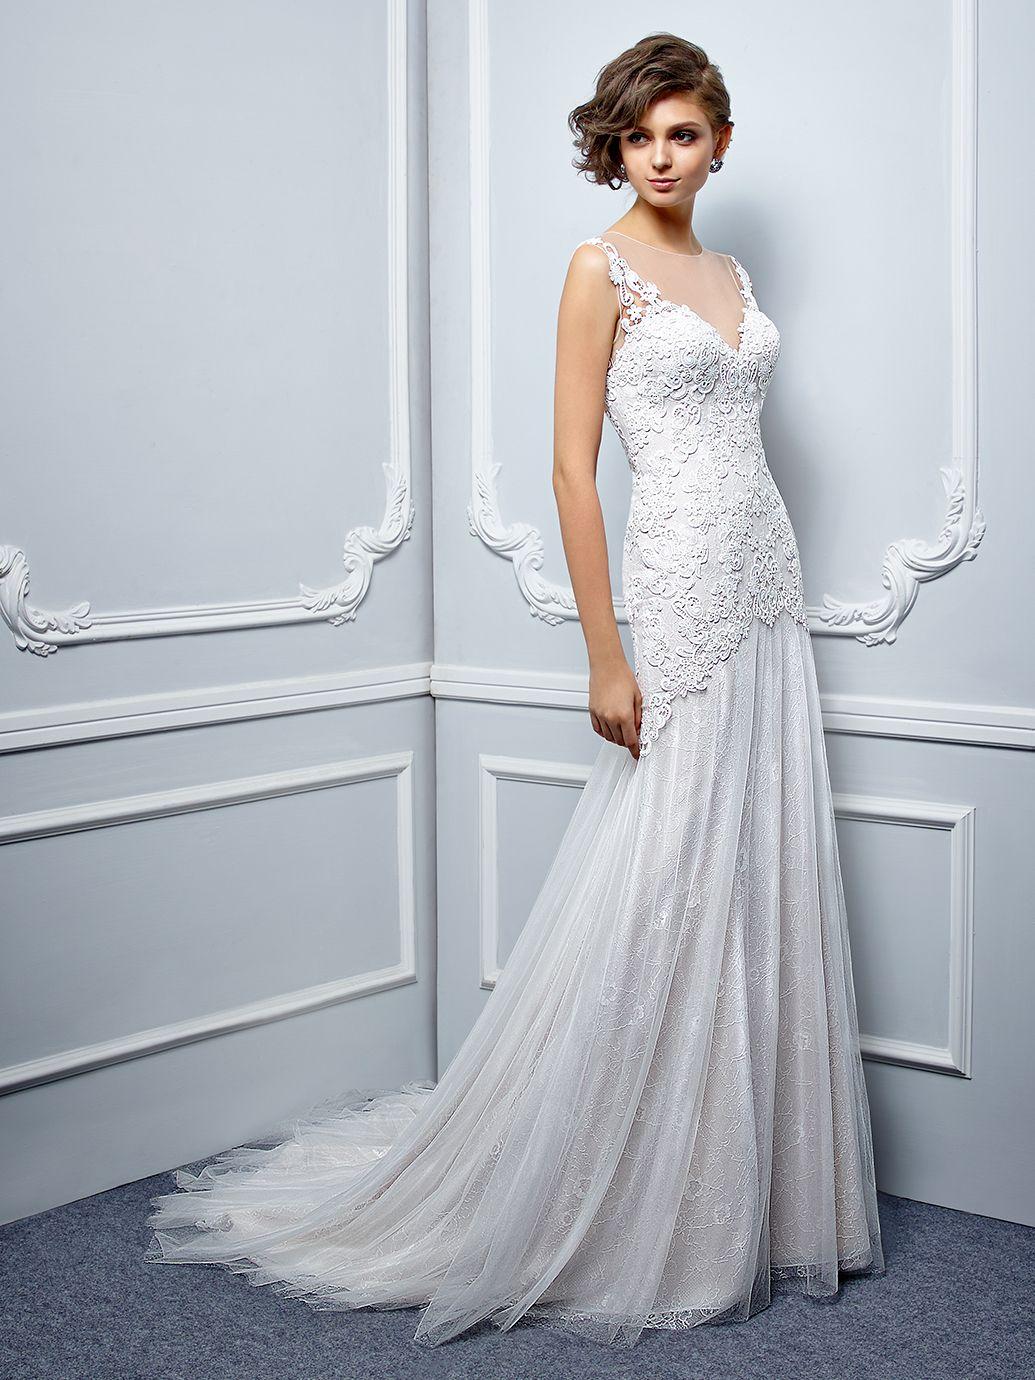 Luxury Bridal Gowns Appleton Wi Crest - All Wedding Dresses ...